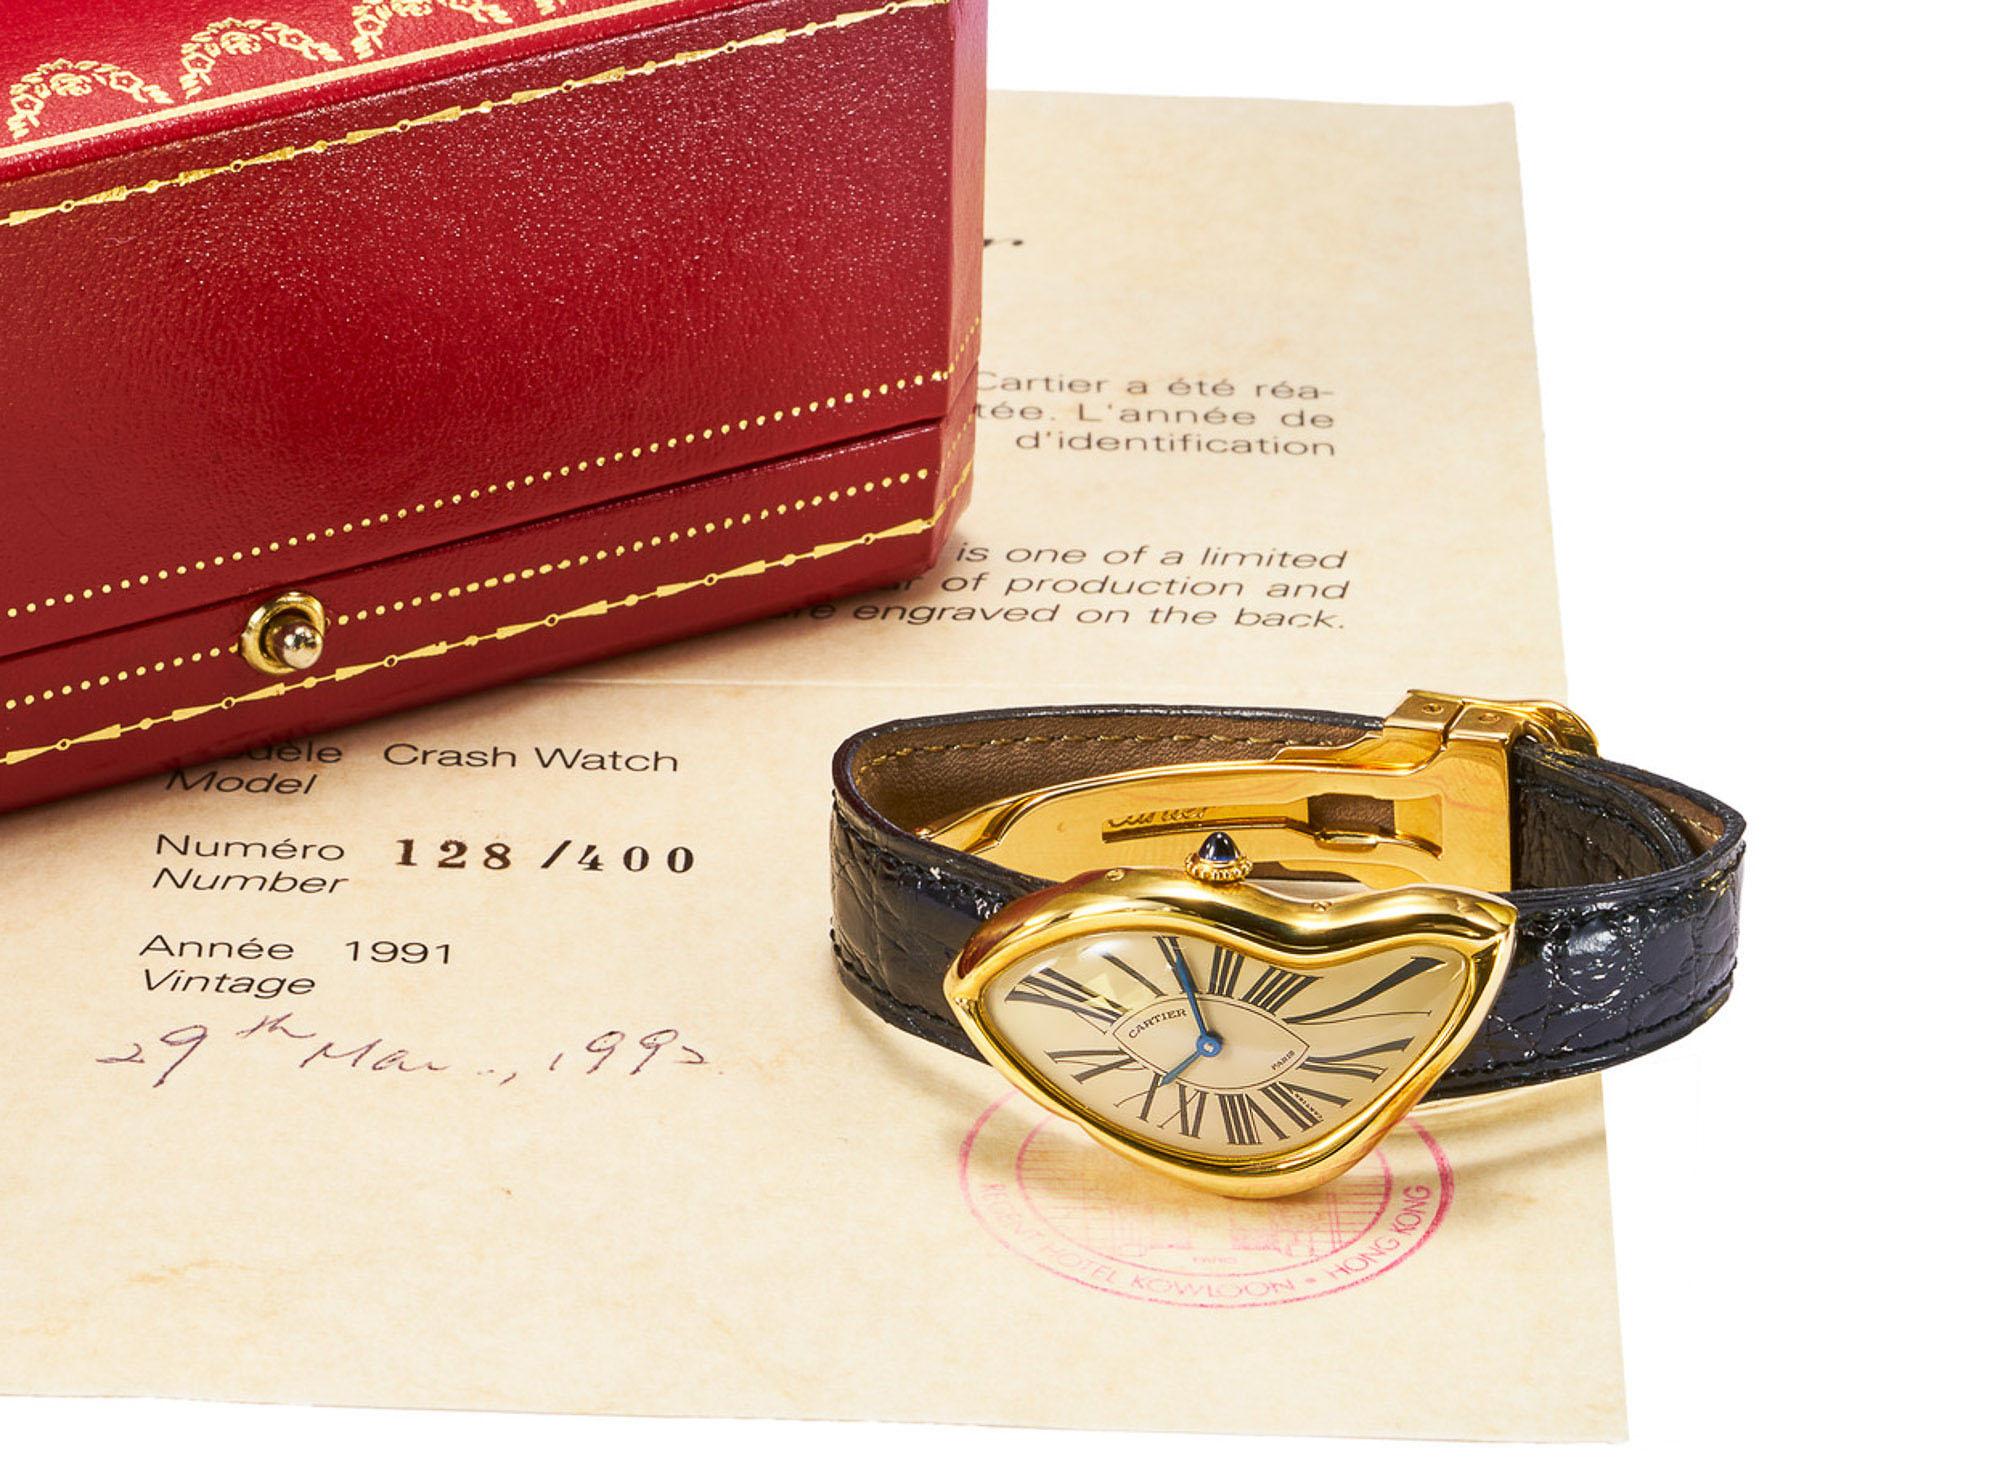 Antiquorum Auction May 2020 Cartier Crash Watch 1991